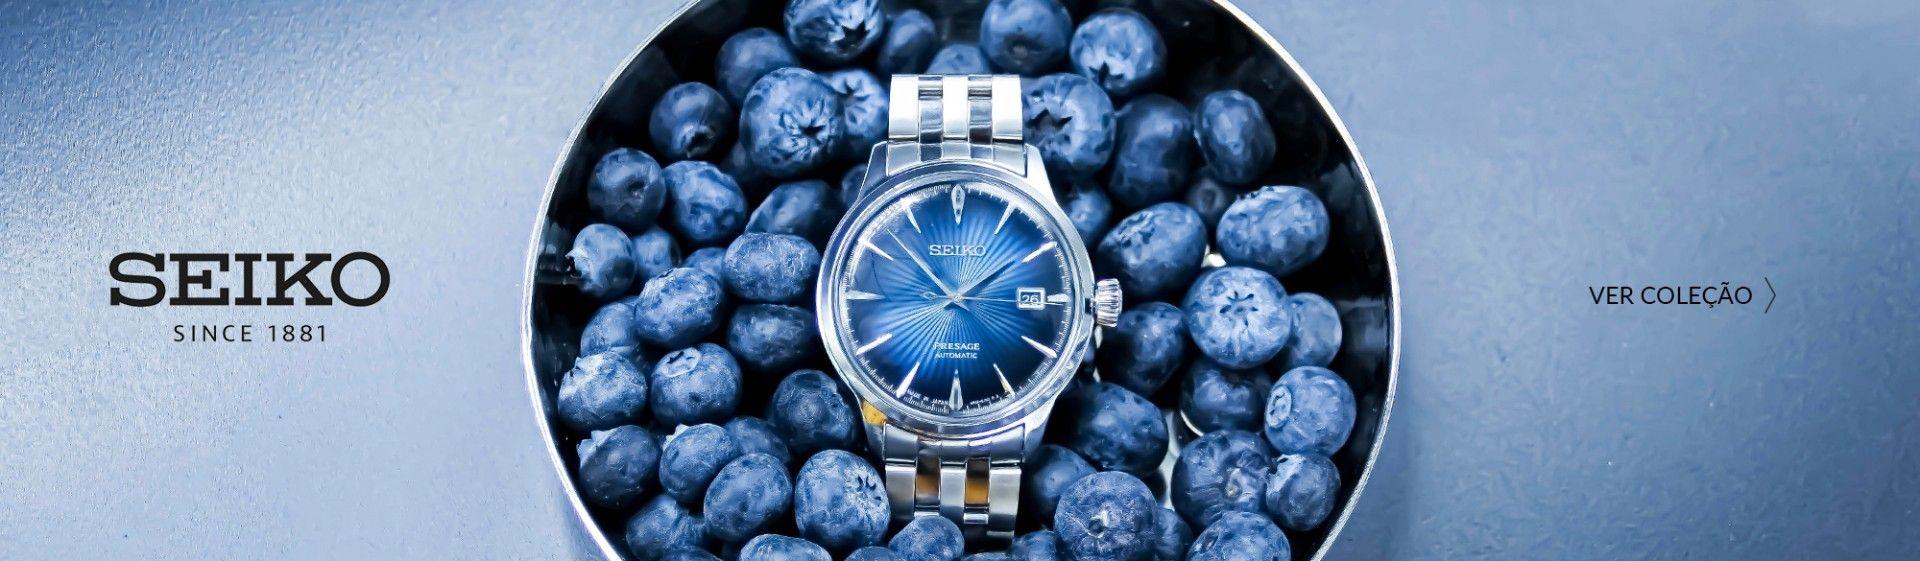 BlueBird - Relojoaria e Joalharia - Ourivesaria Online